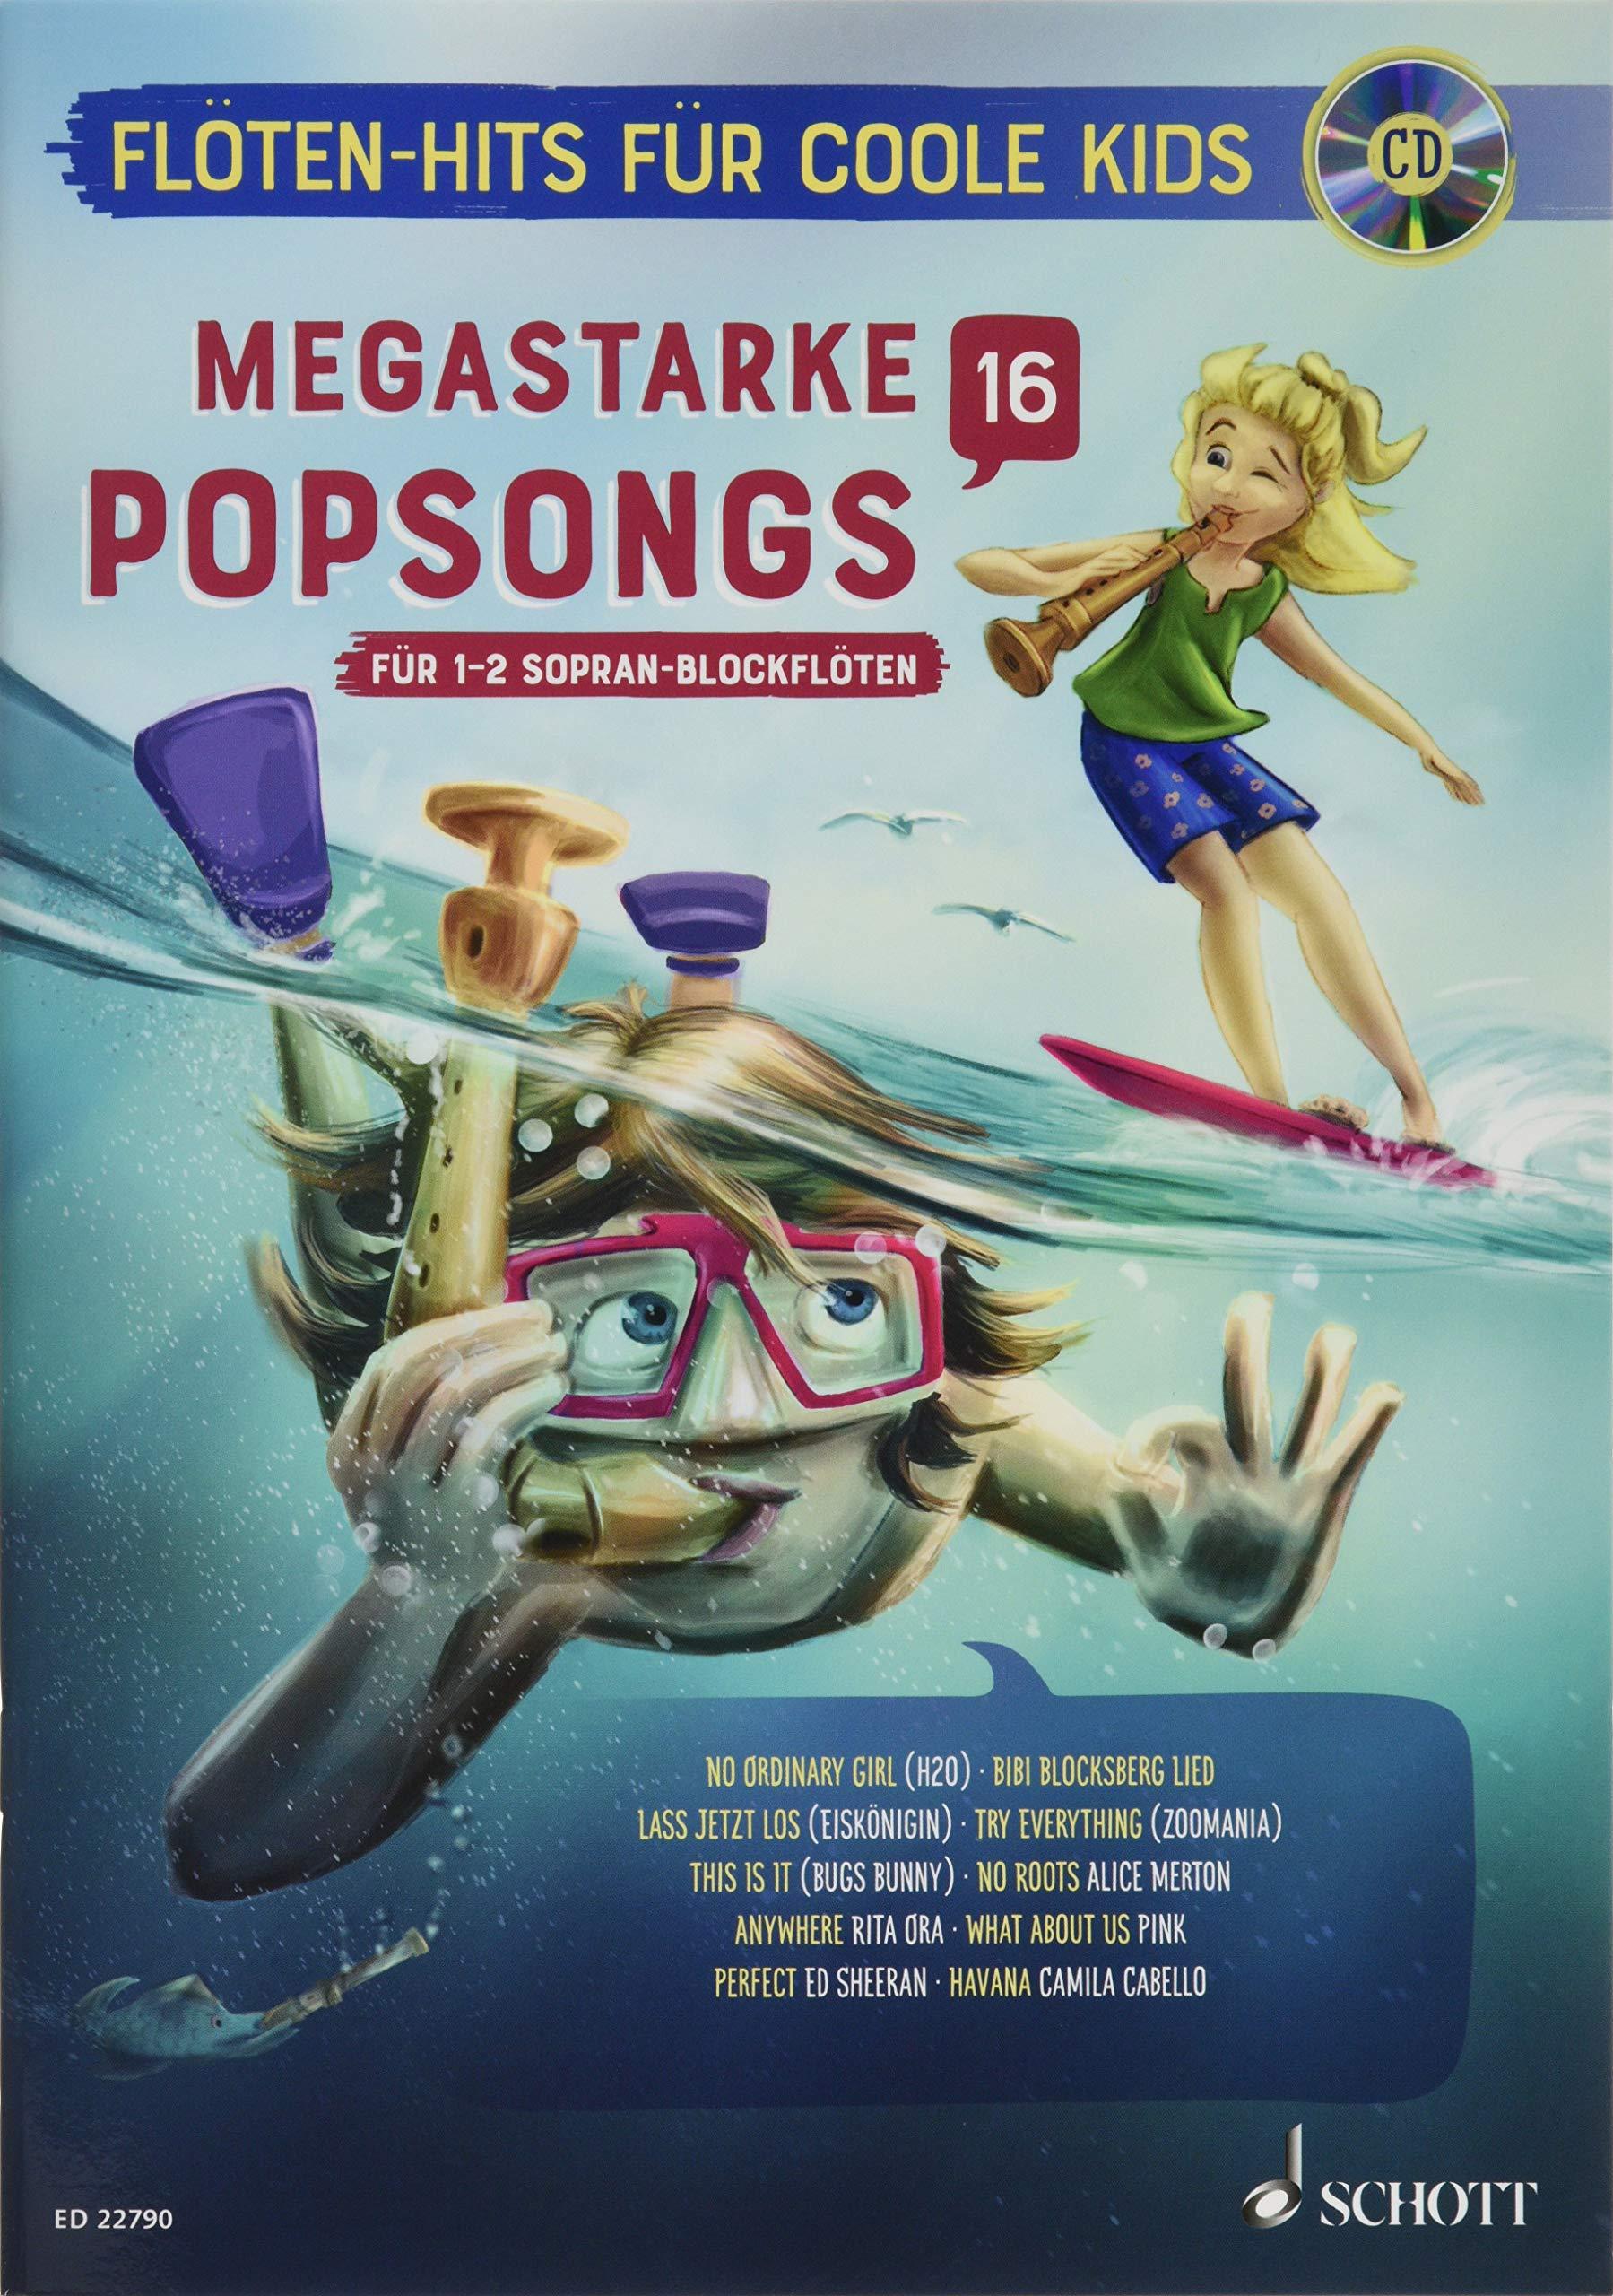 Megastarke Popsongs  Band 16. 1 2 Sopran Blockflöten. Ausgabe Mit CD.  Flöten Hits Für Coole Kids